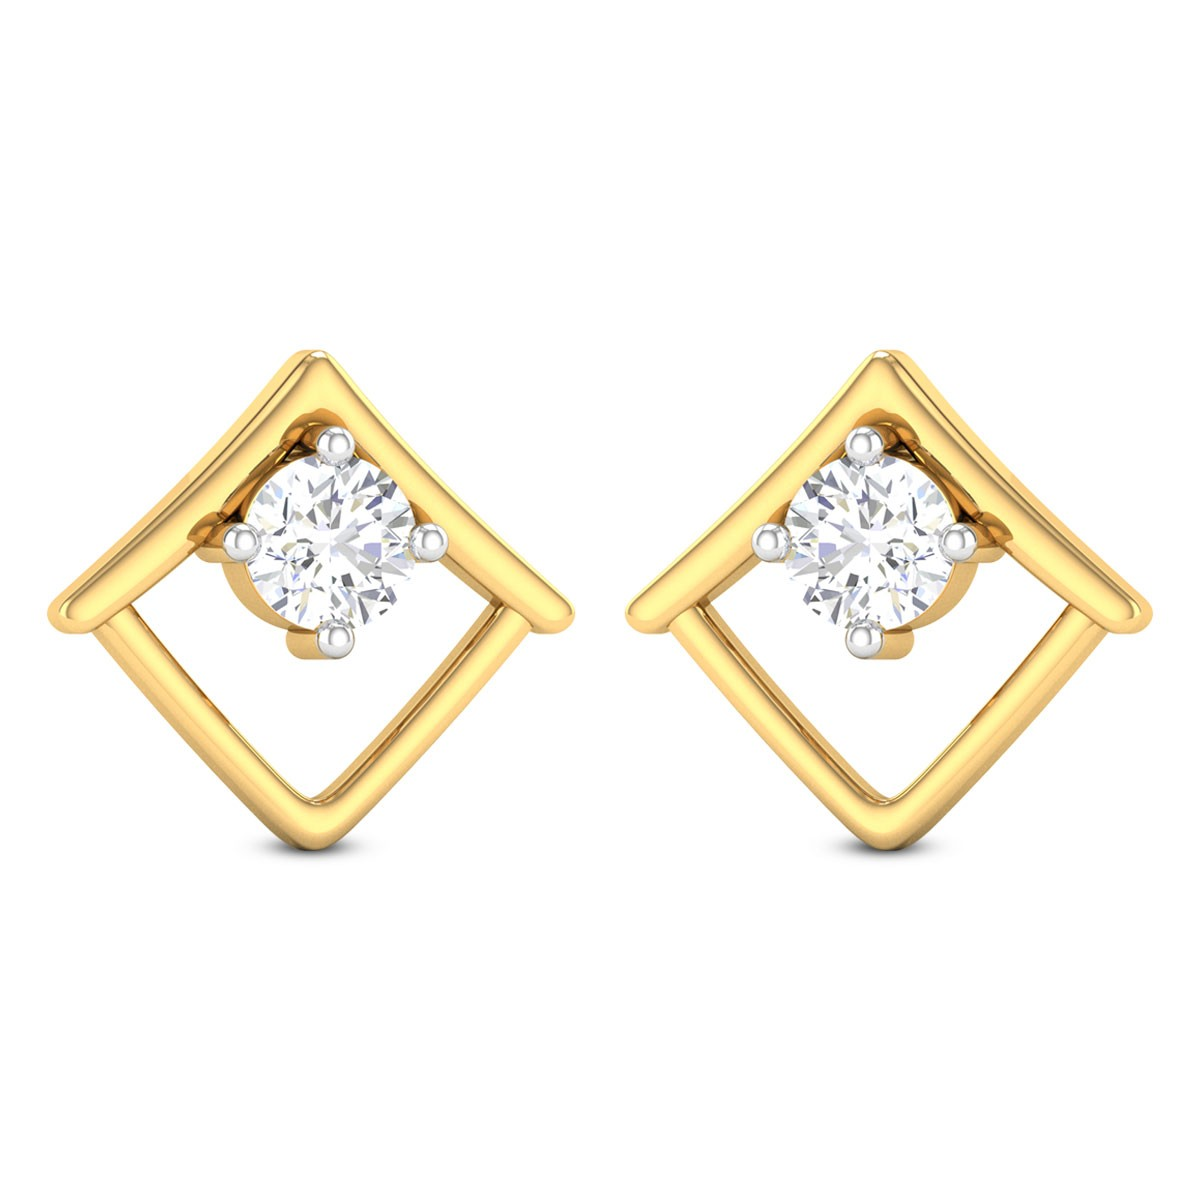 Yulia Solitaire Stud Earrings